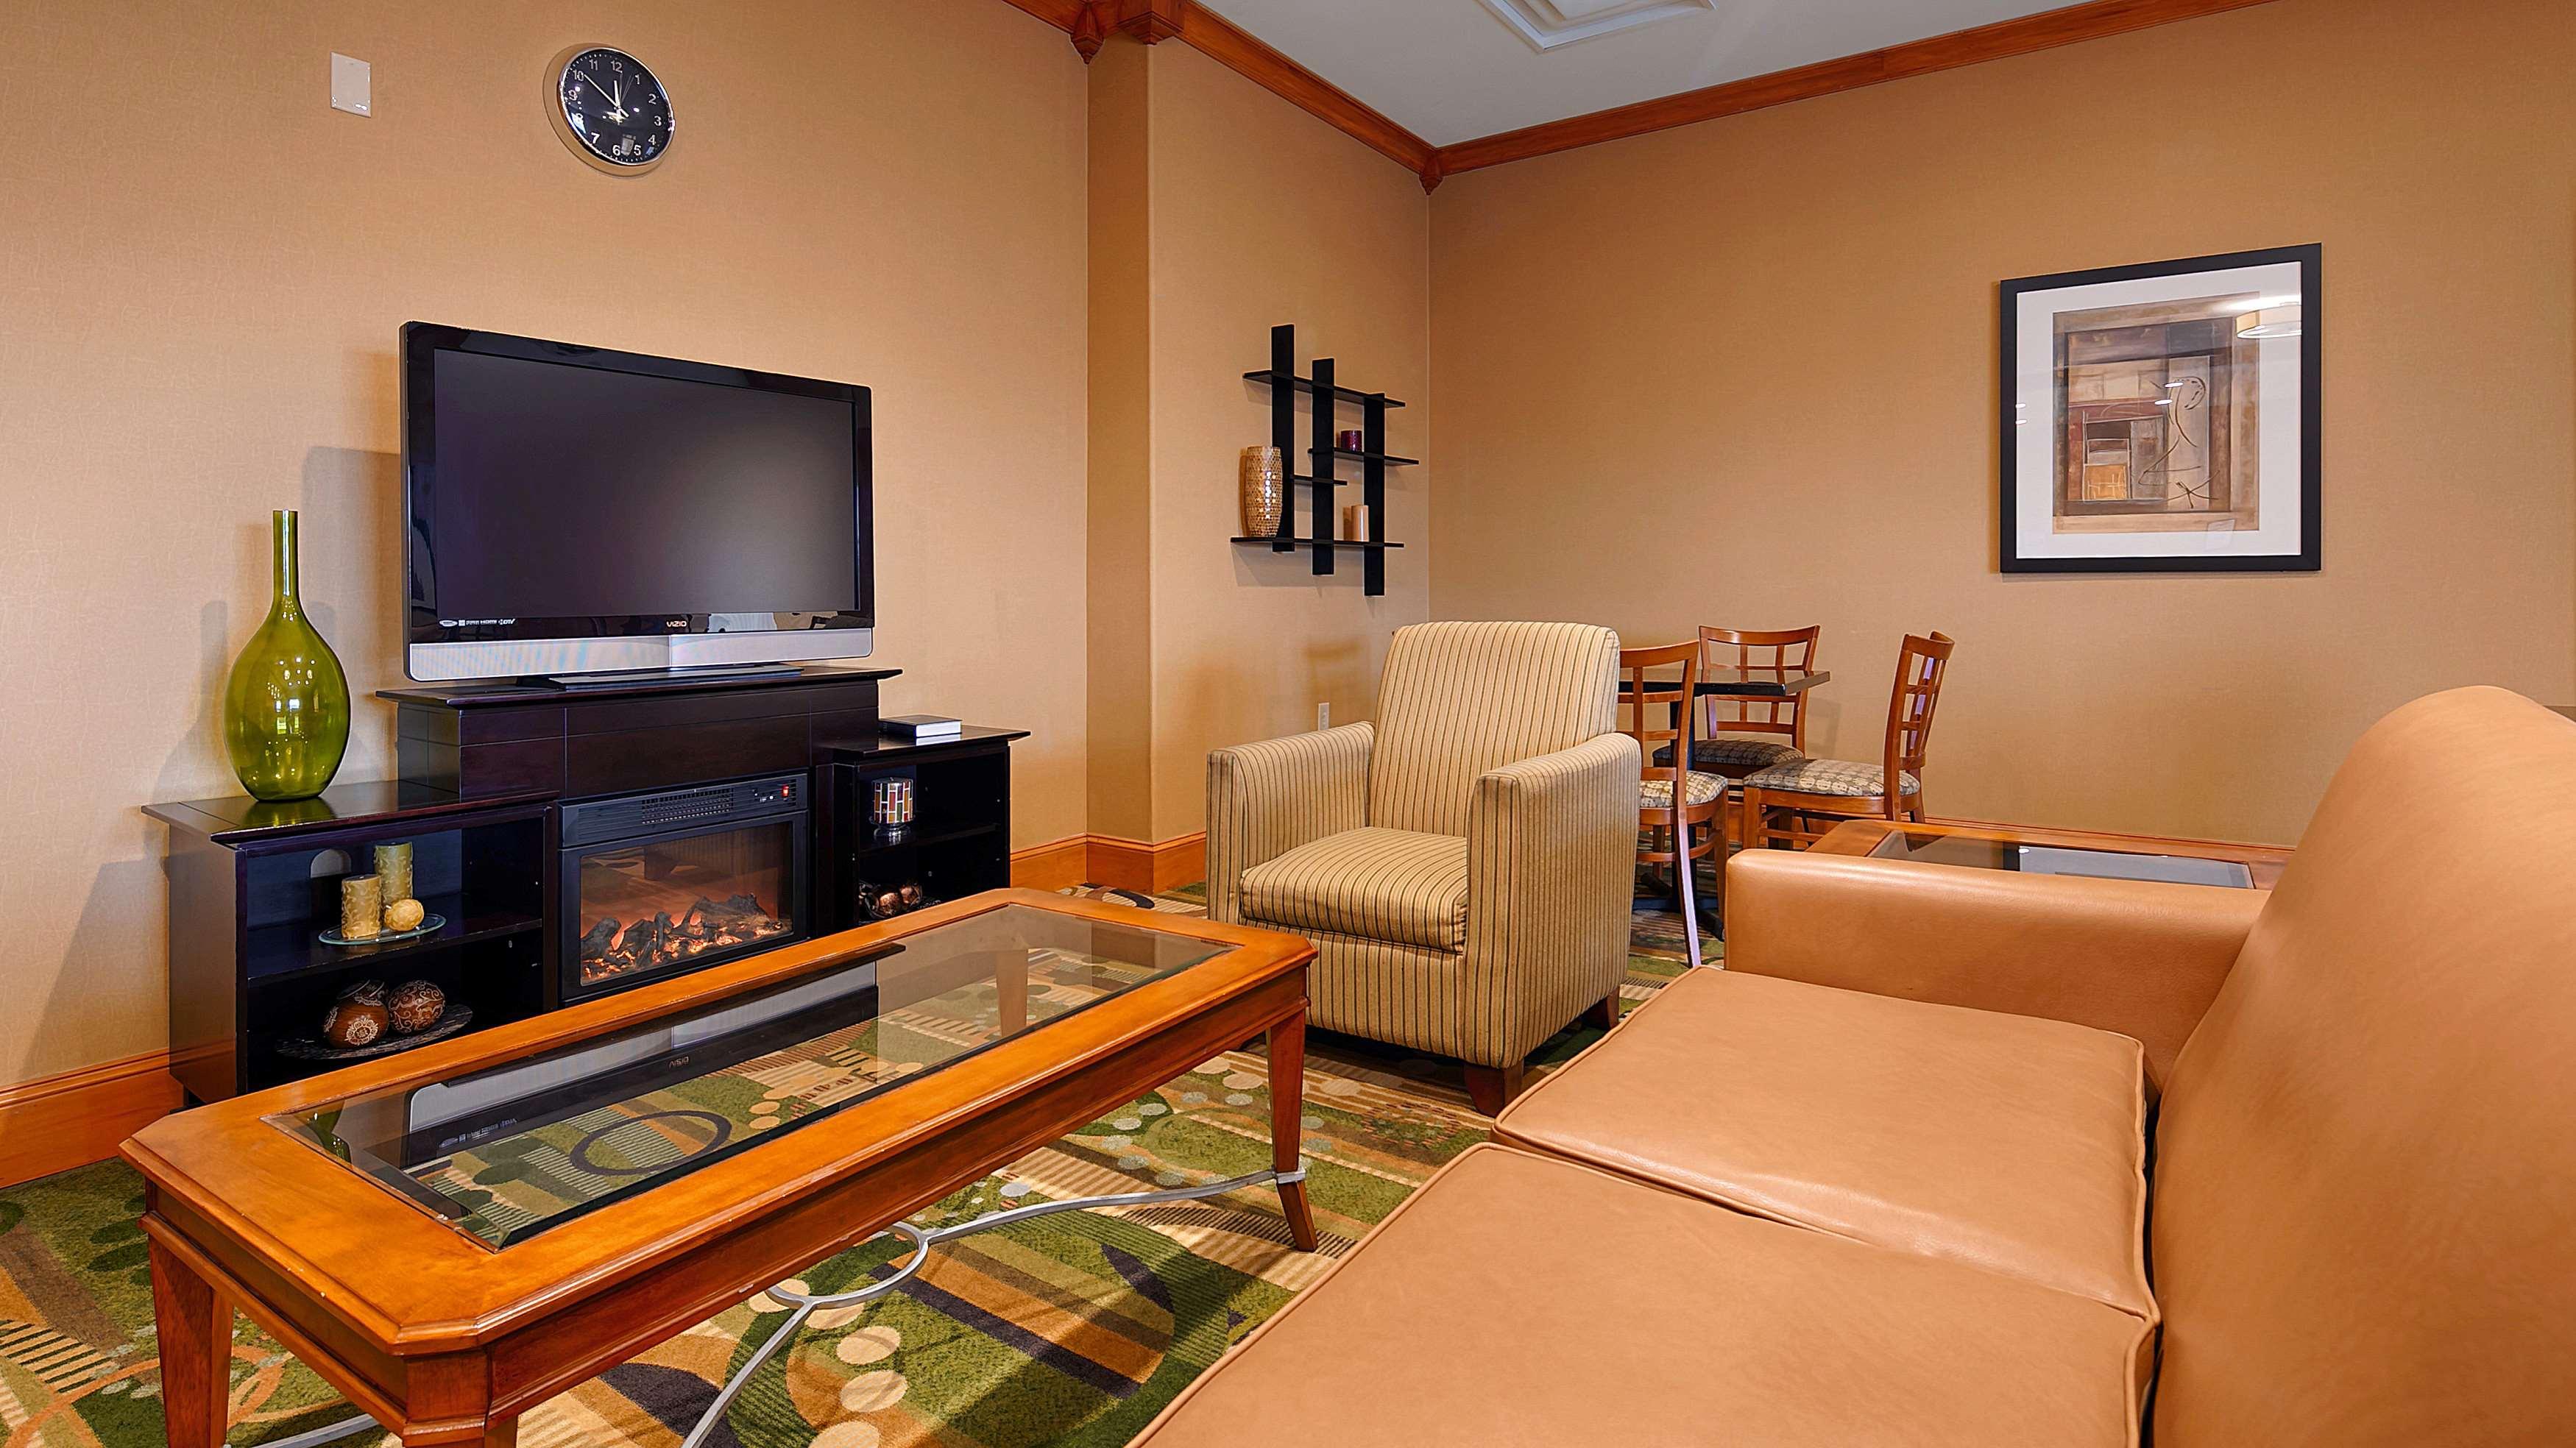 Best Western Plus Rose City Conference Center Inn image 1